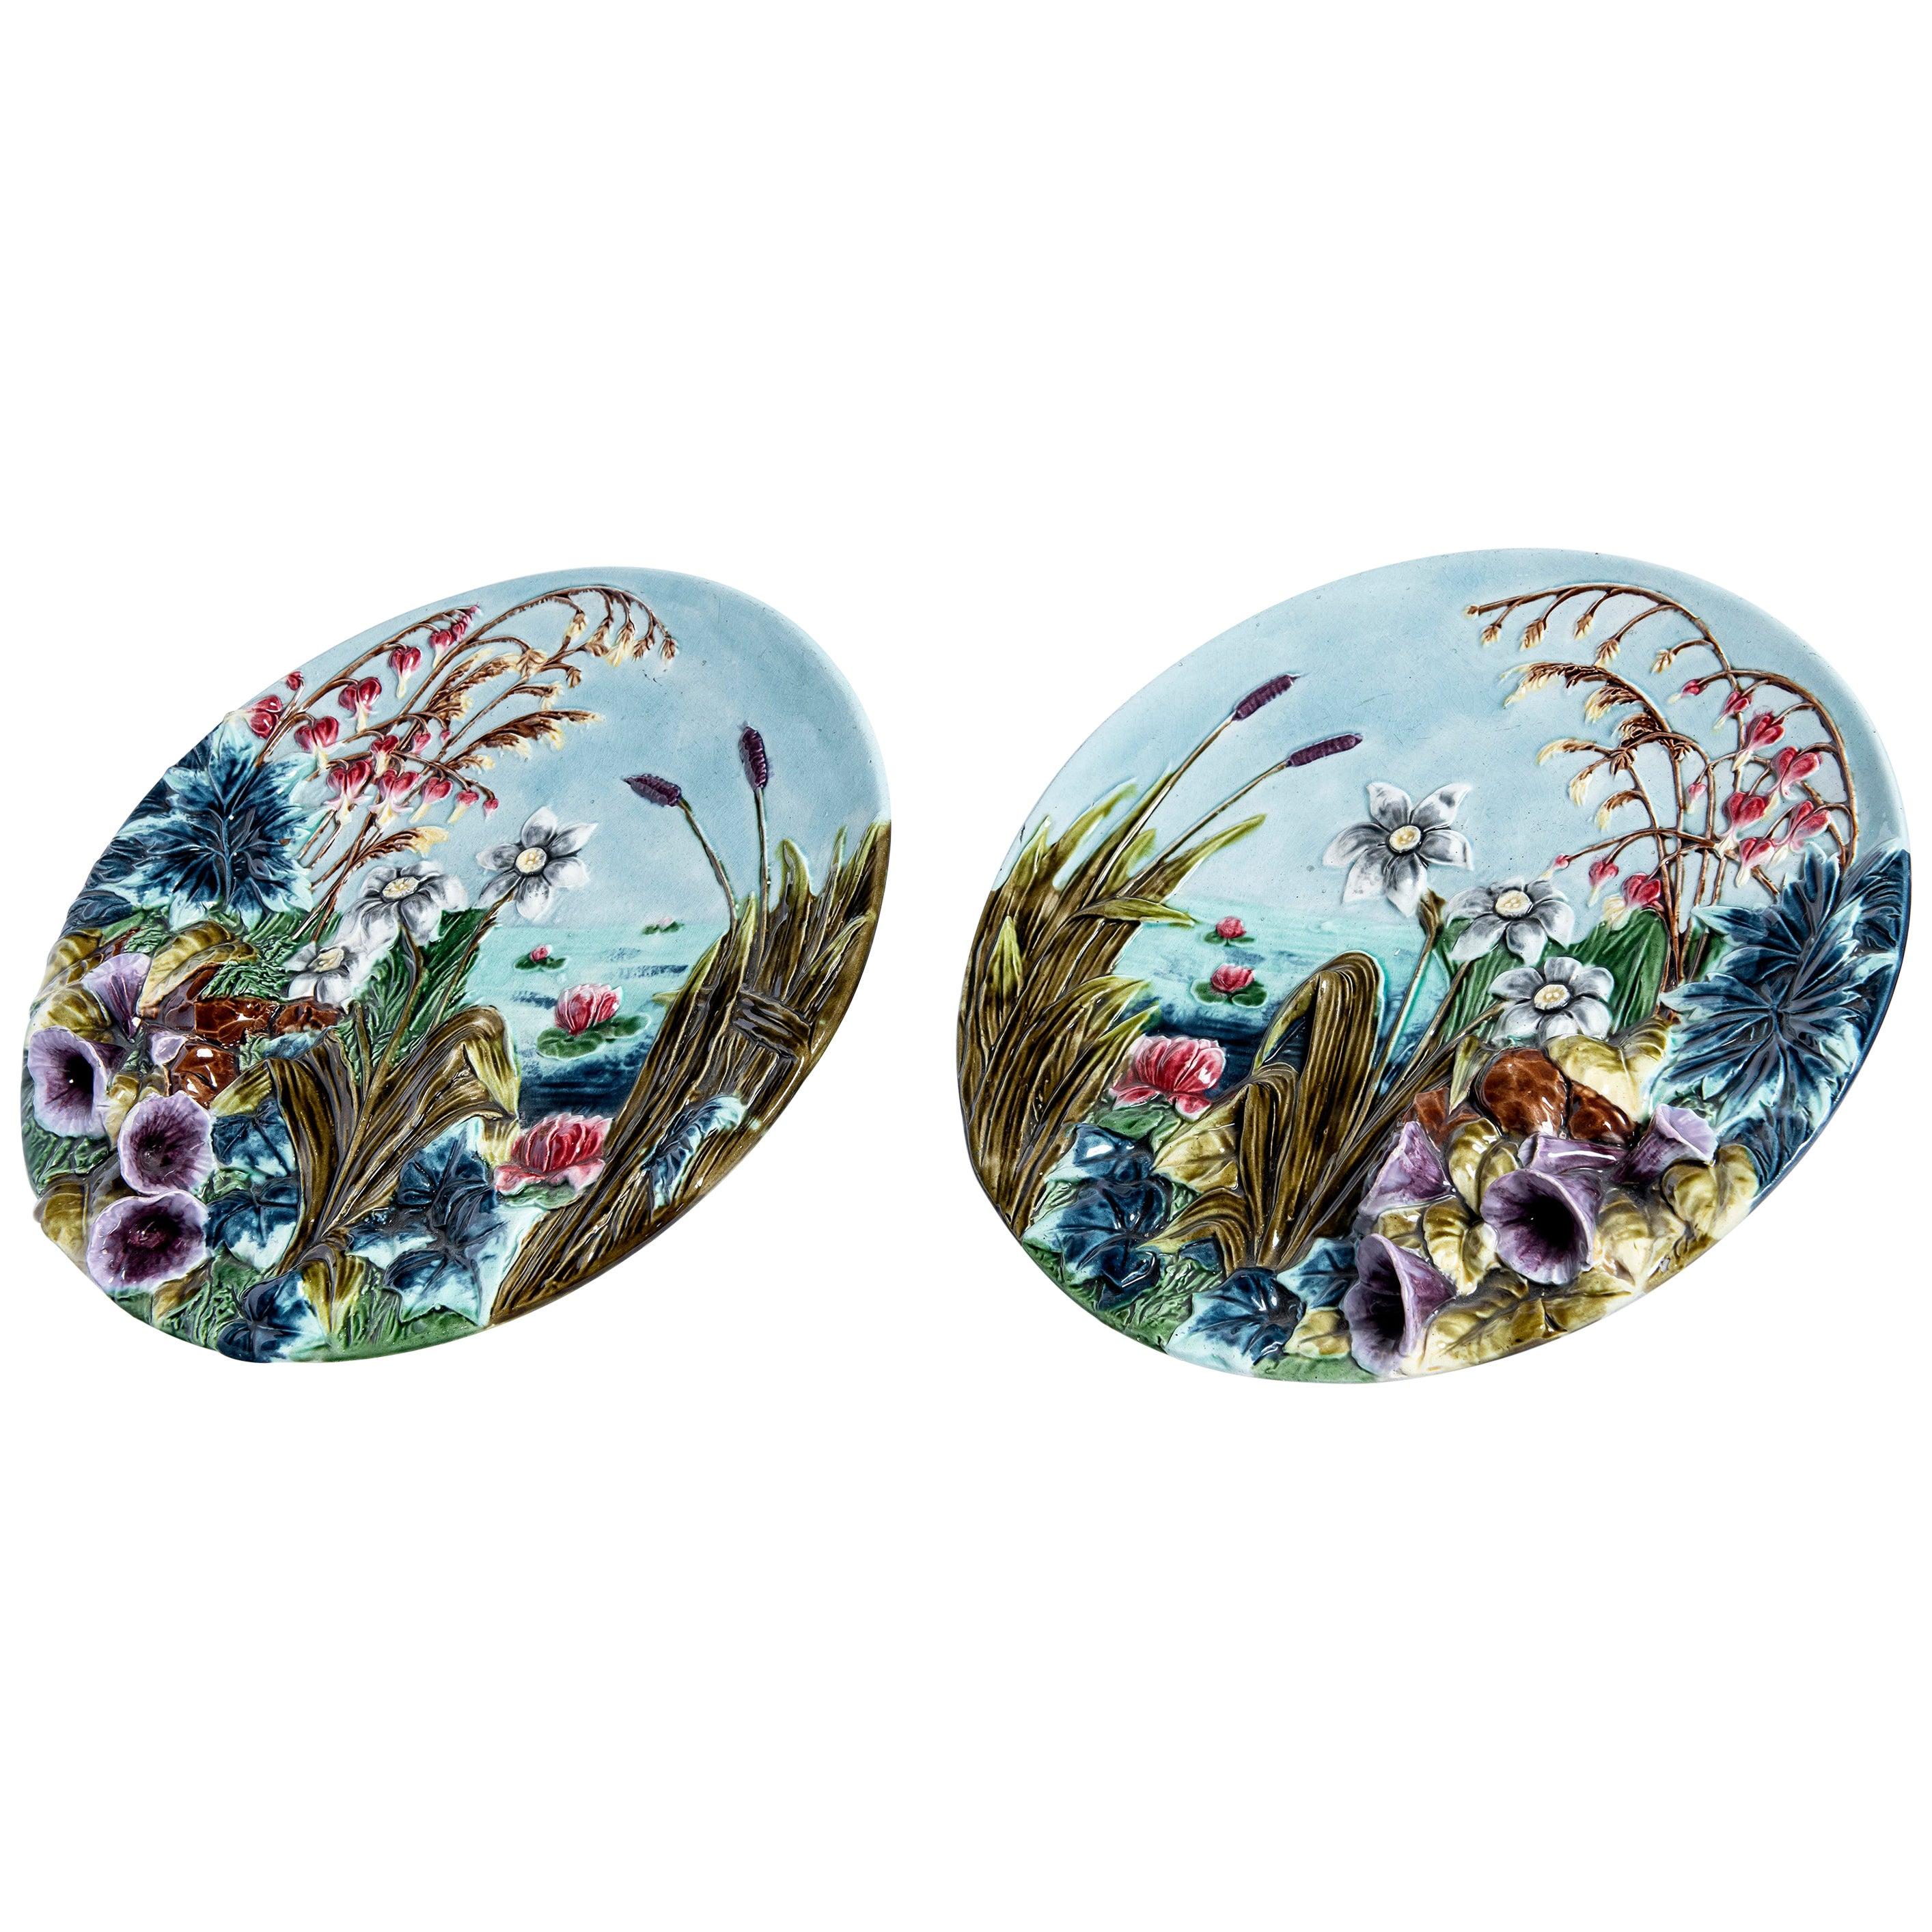 Pair of Barbotine Ceramic Dishes, Art Nouveau Period, France, circa 1890